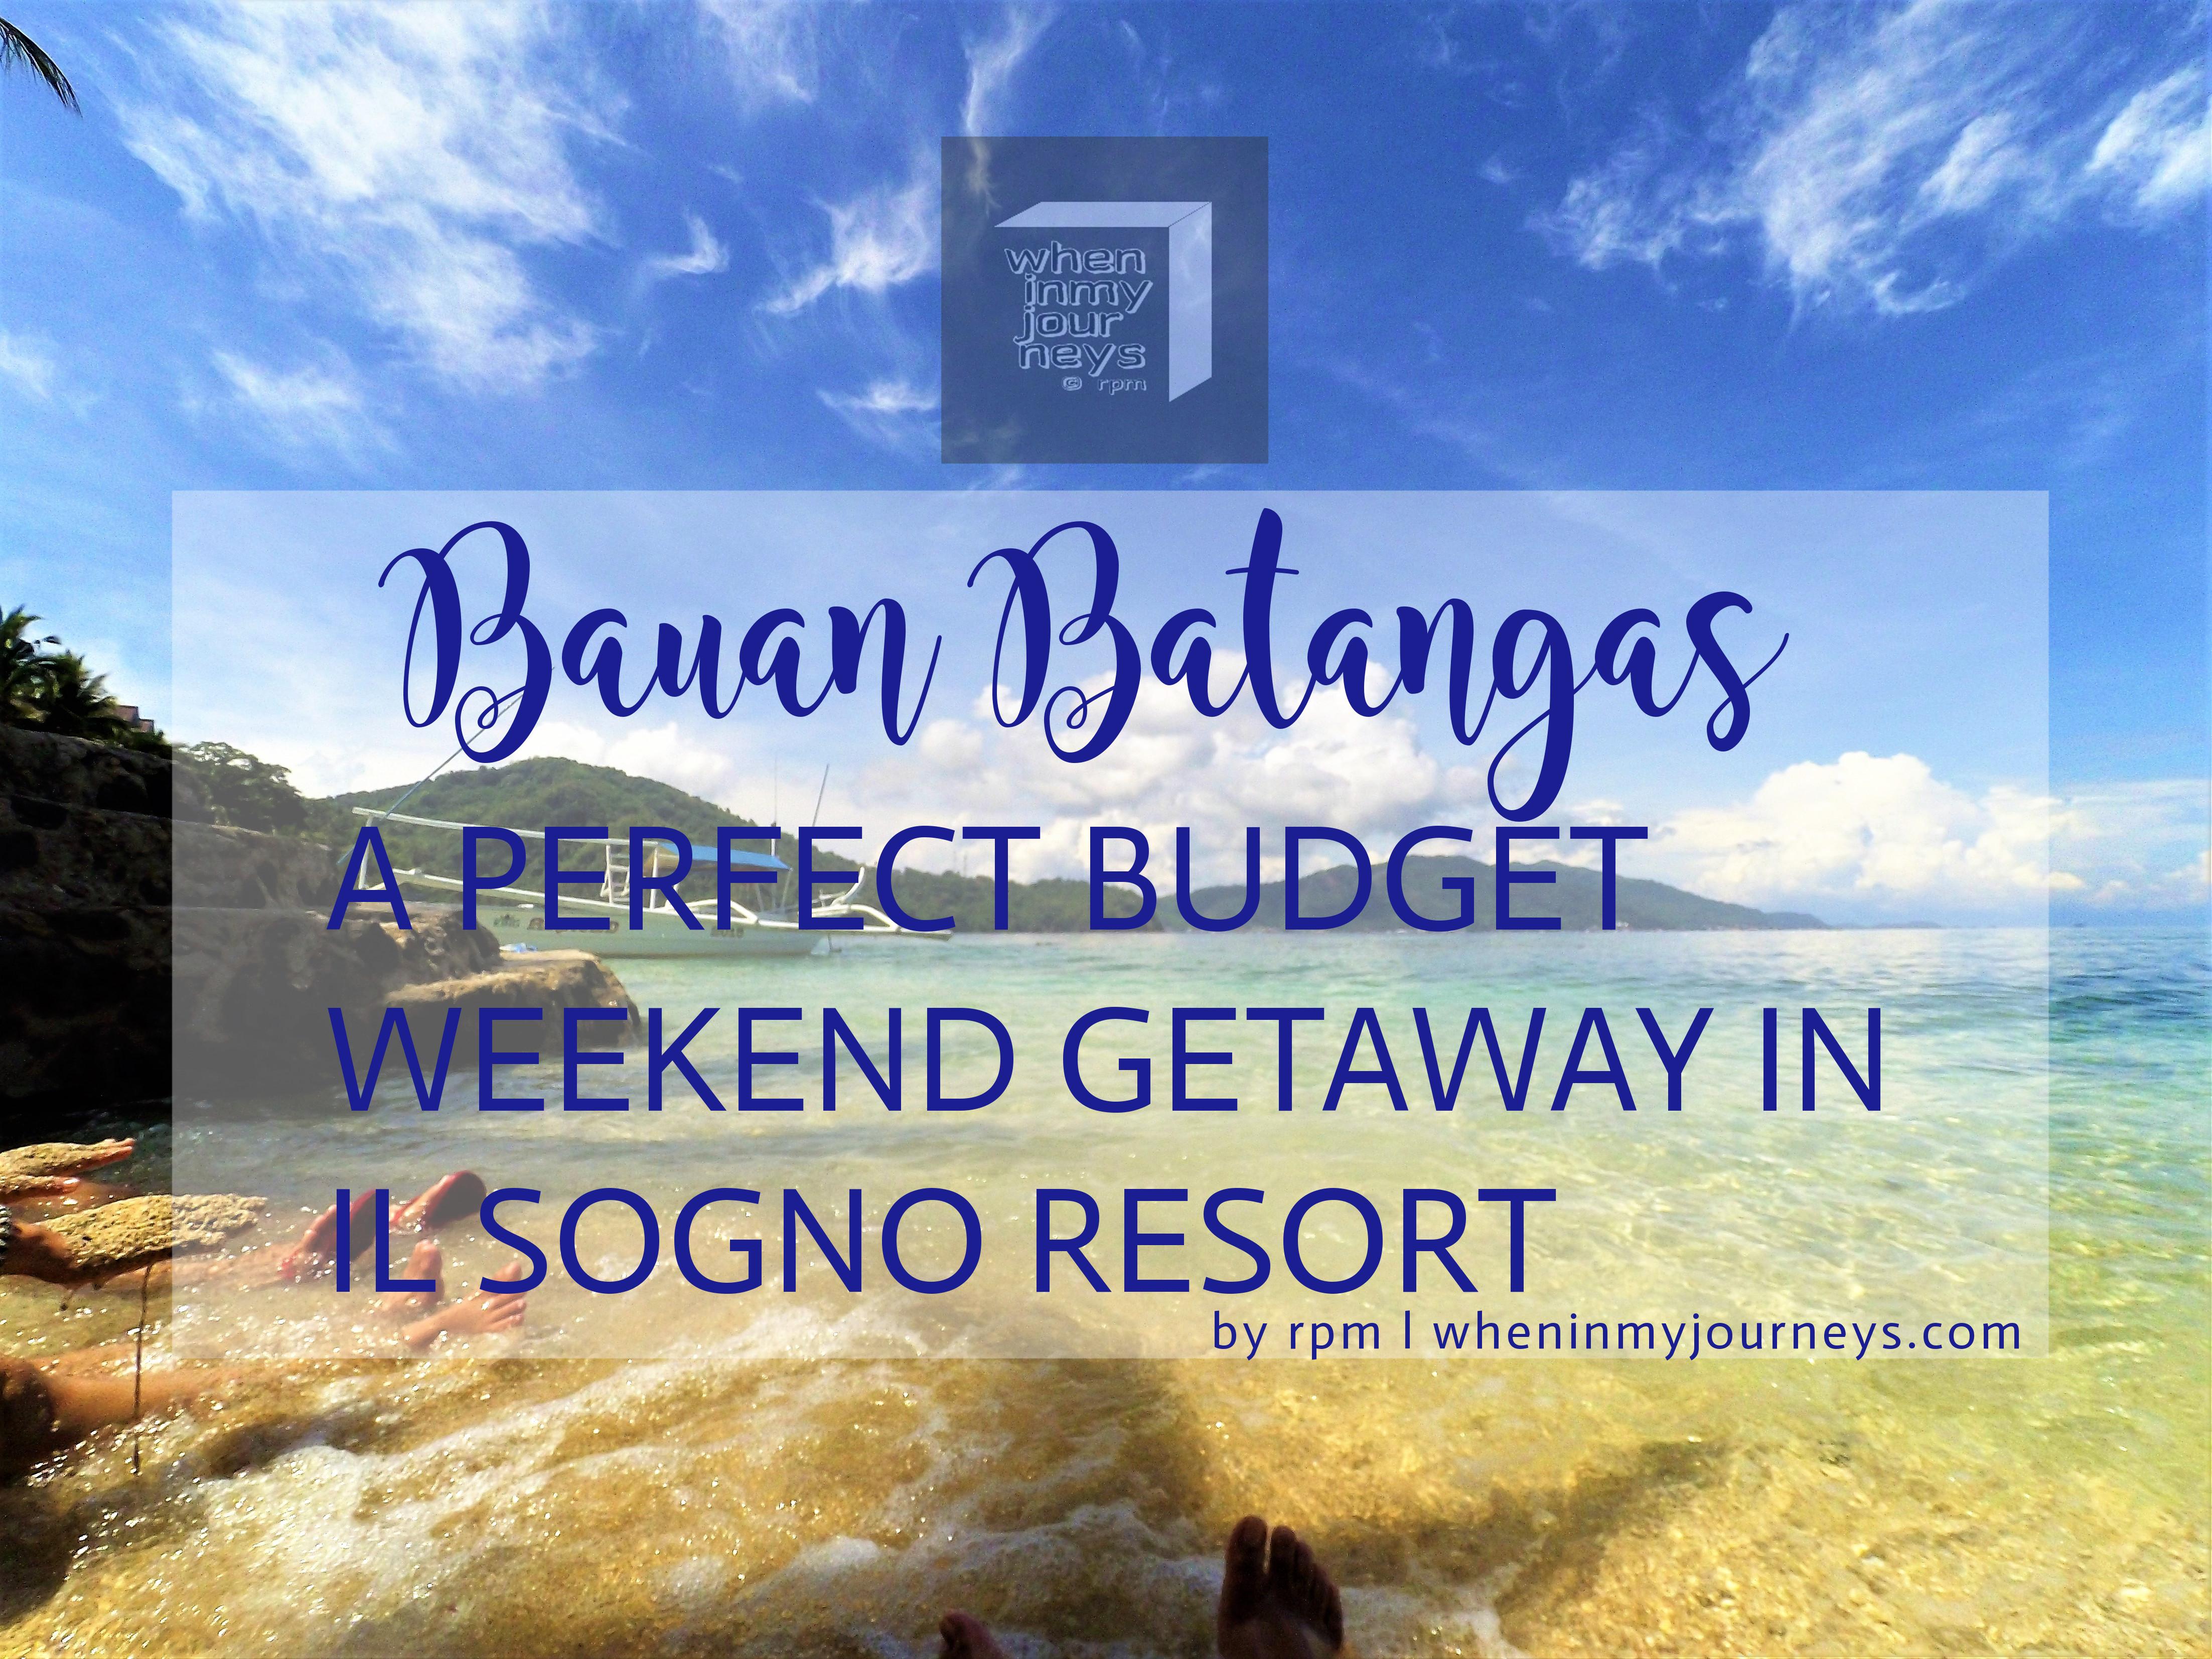 Bauan Batangas A Perfect Budget Weekend Getaway In Il